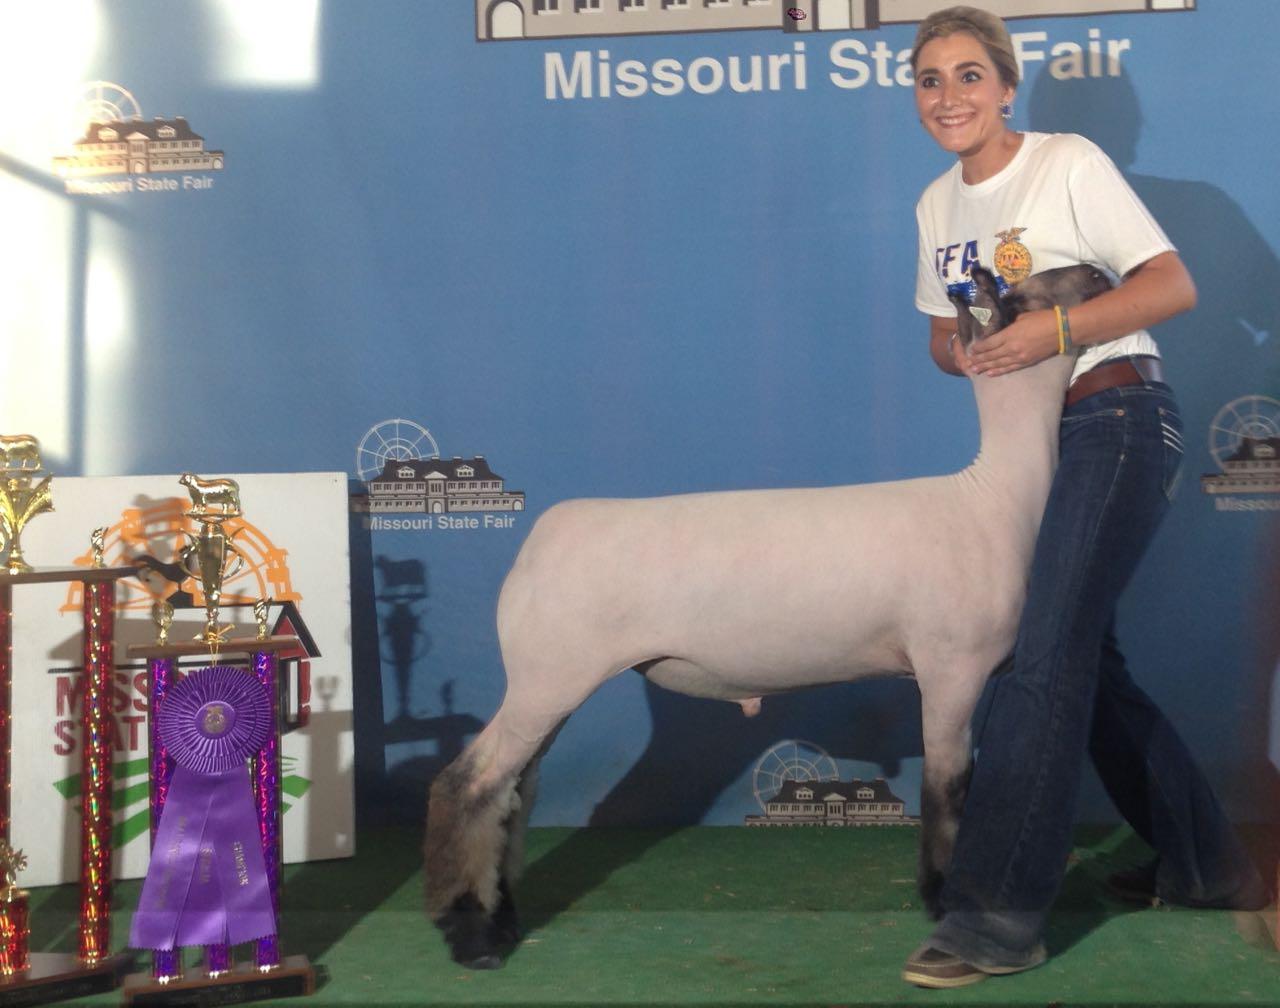 Reserve Grand - 2015 Missouri State FairSire: BIg Papi (WH 4-033)Dam: True Blood daughterBreeder: Amstutz Club Lambs